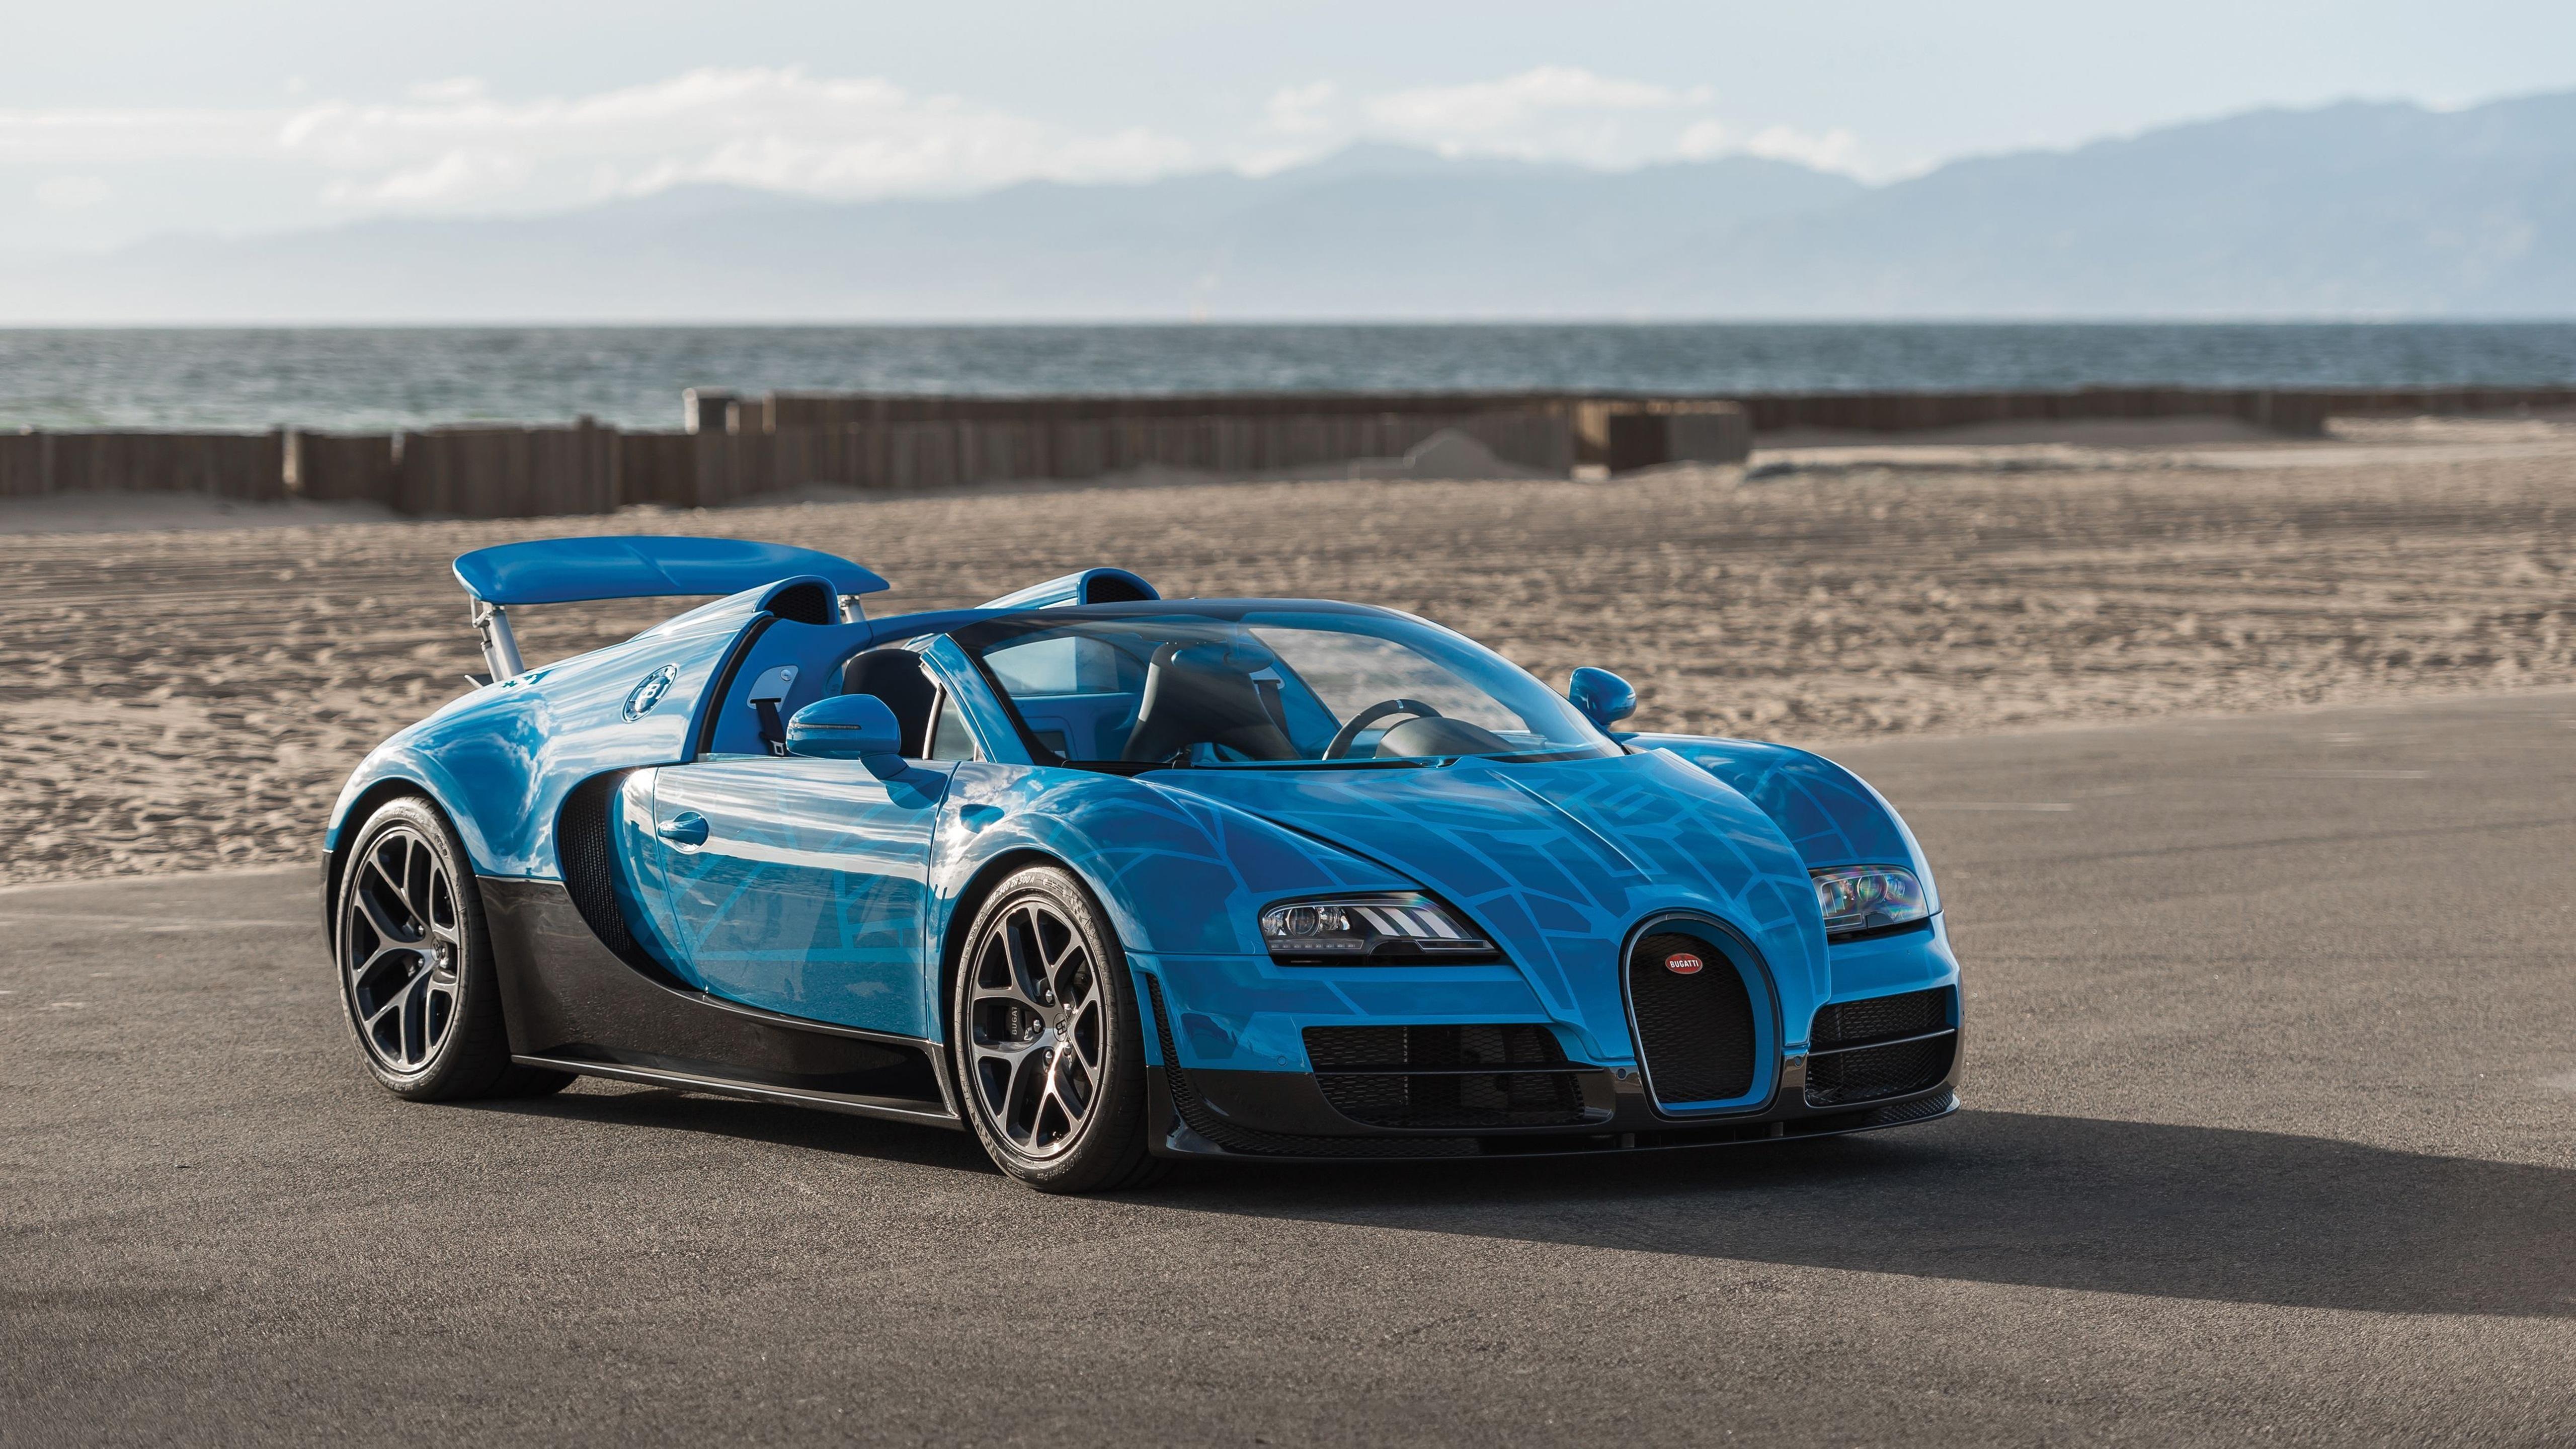 Blue Bugatti Veyron Super Sport Desktop Wallpaper Blue Bugatti Veyron Super Sport 5120x2880 Wallpaper Teahub Io